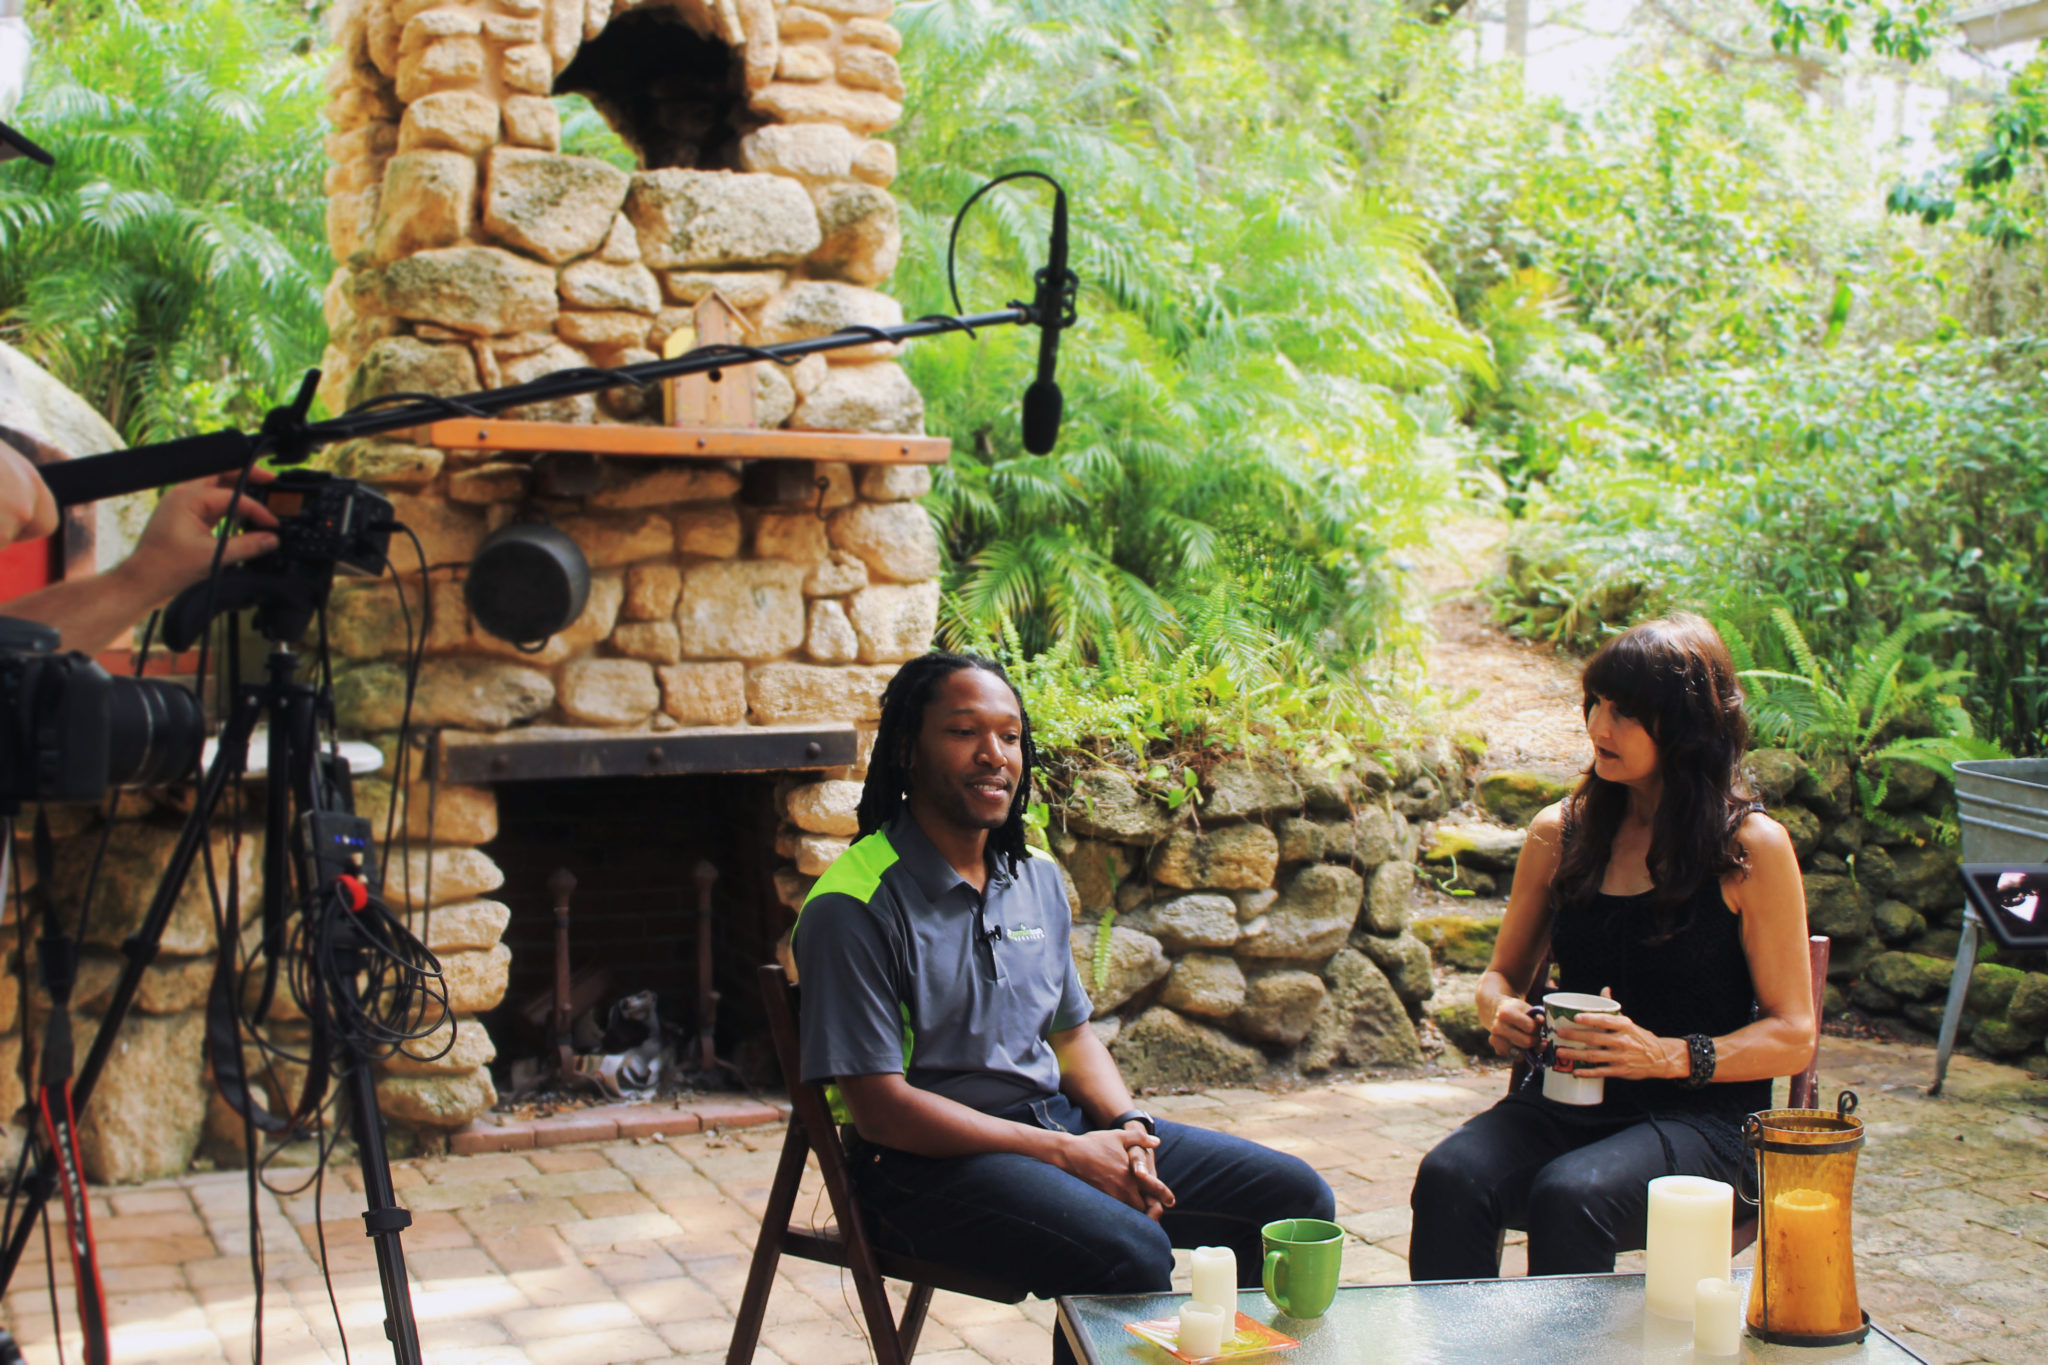 Jamison Gavin Entrepreneur having a conversation with Pam Hoelzle of Dear Rockstar